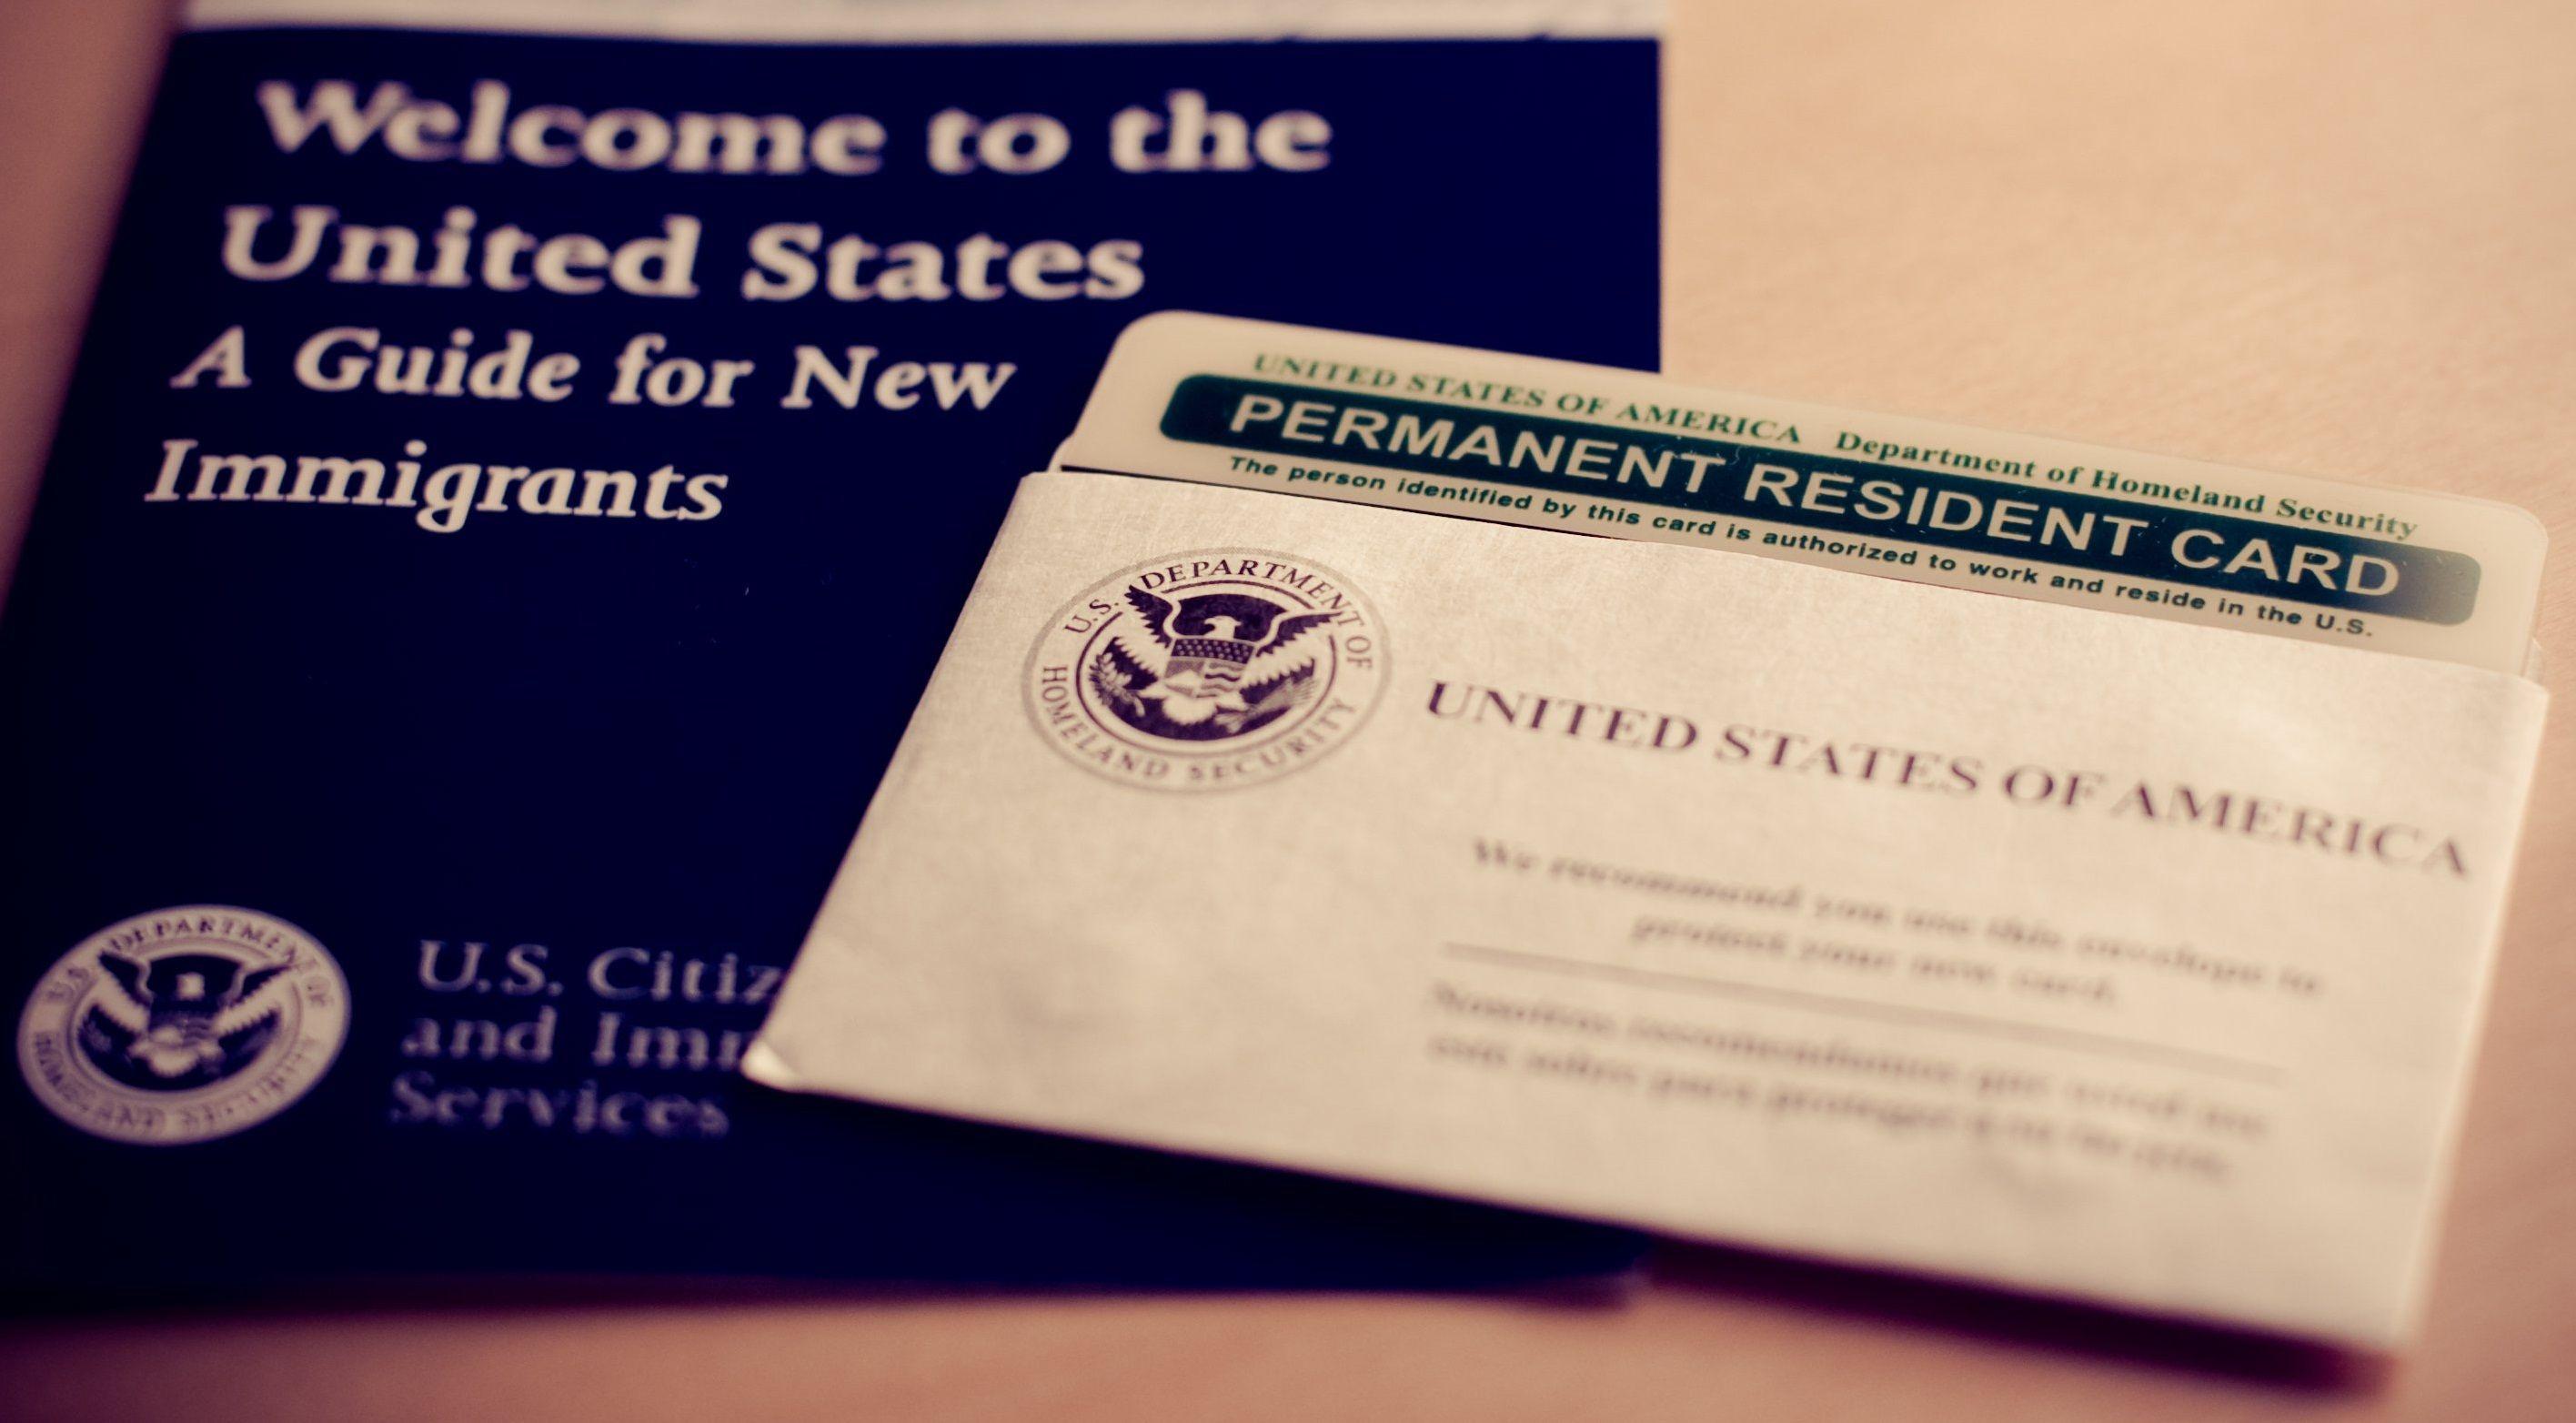 Home in 2020 green cards passport online certificates